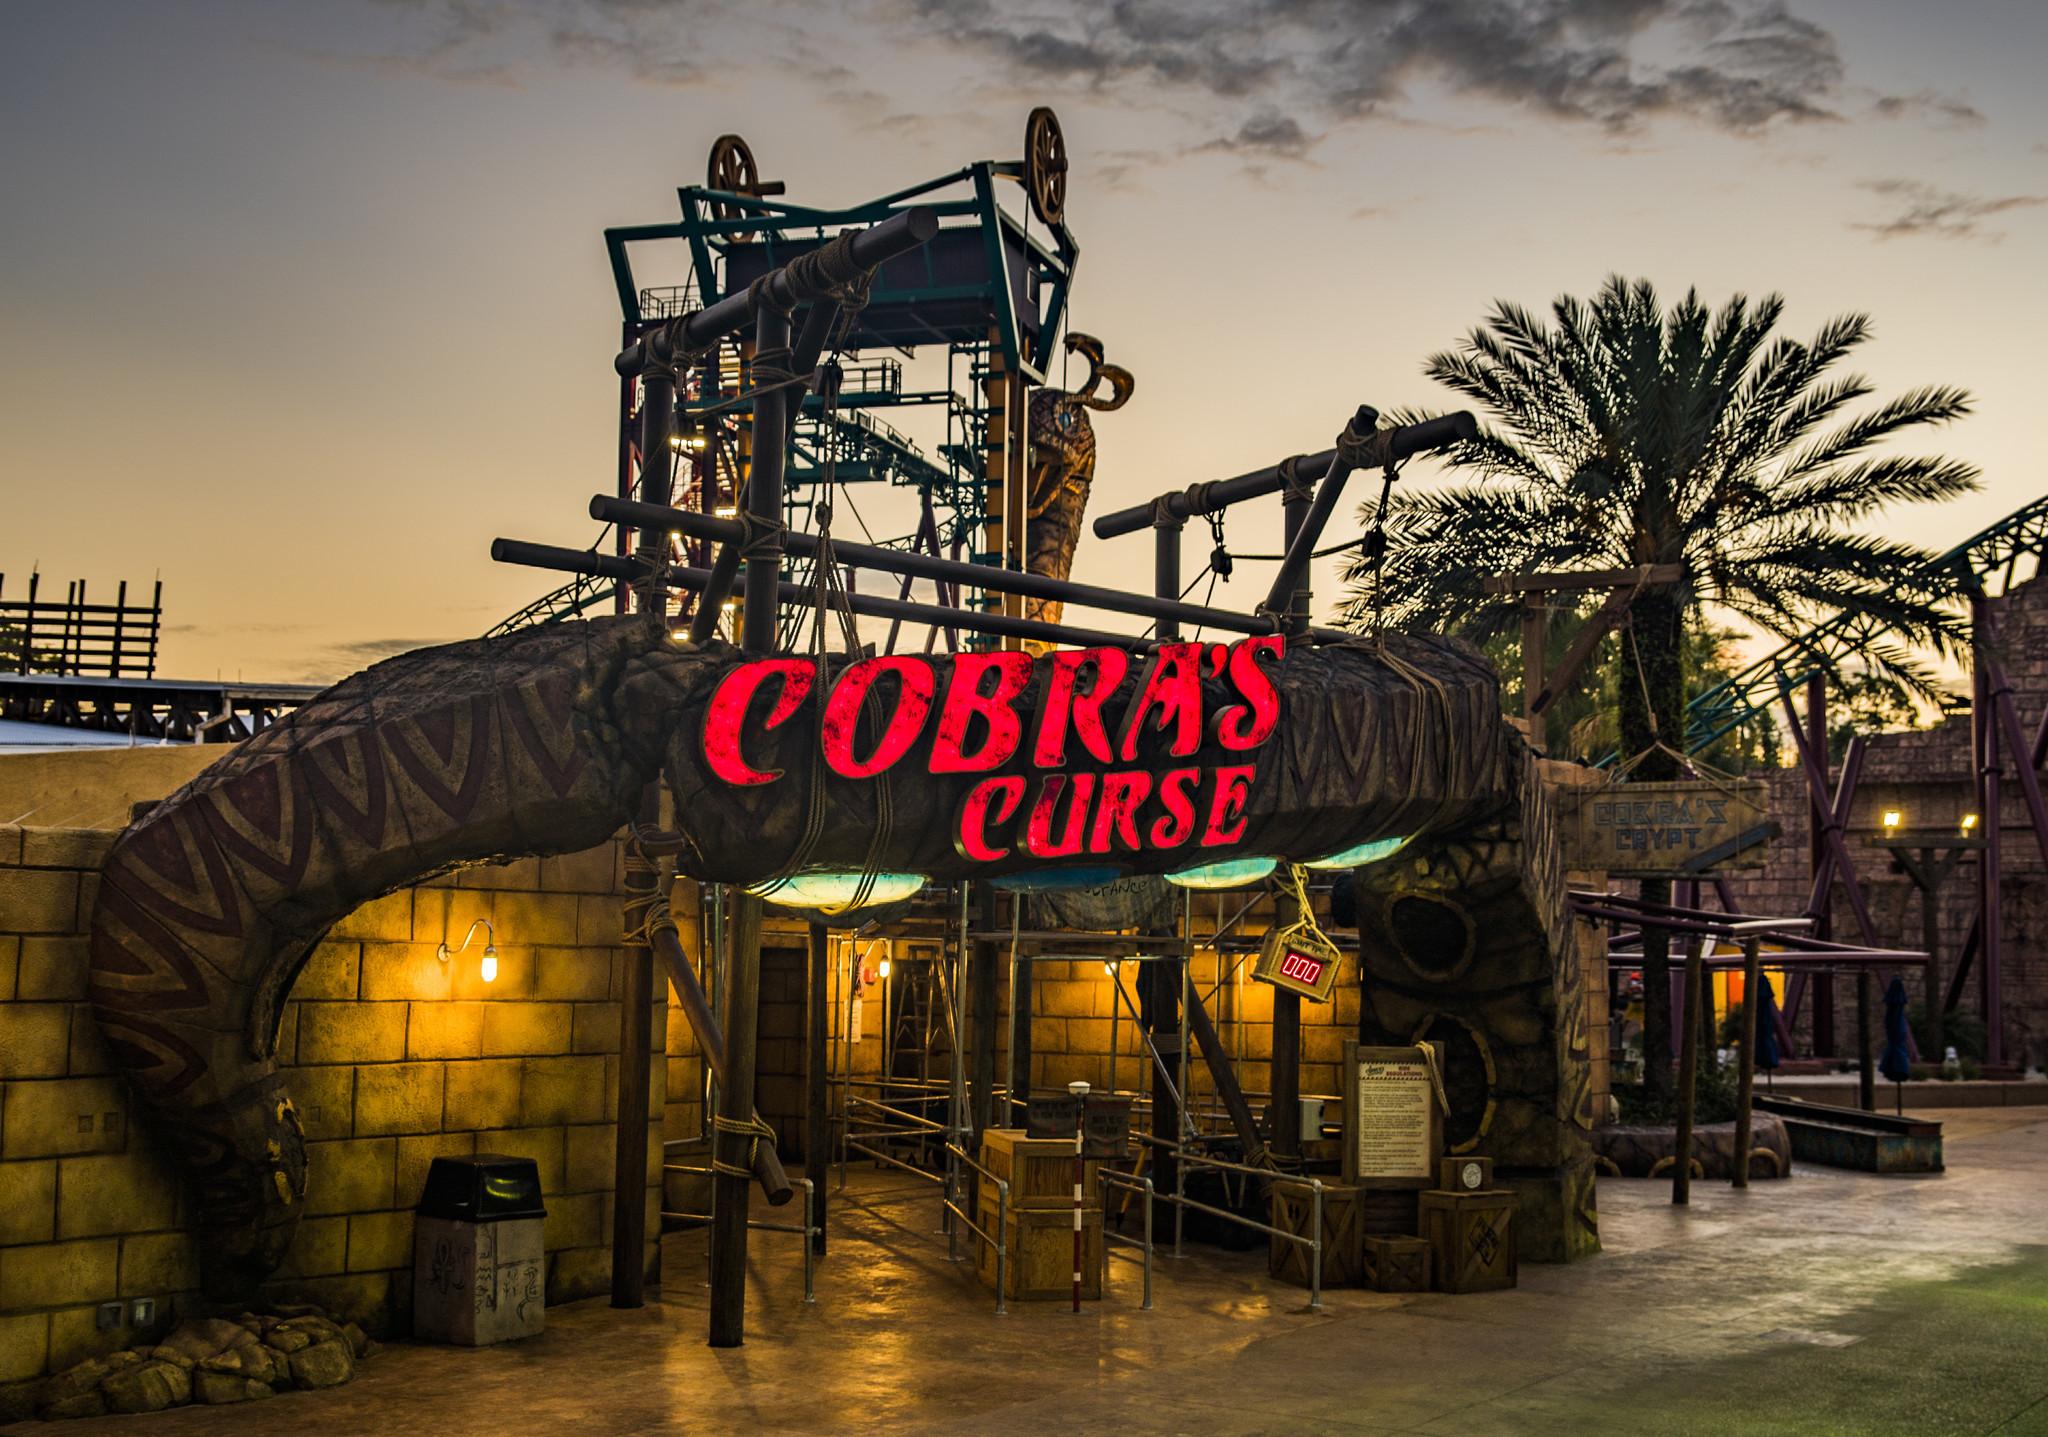 Busch Gardens: Cobra\'s Curse to open June 17 - Orlando Sentinel